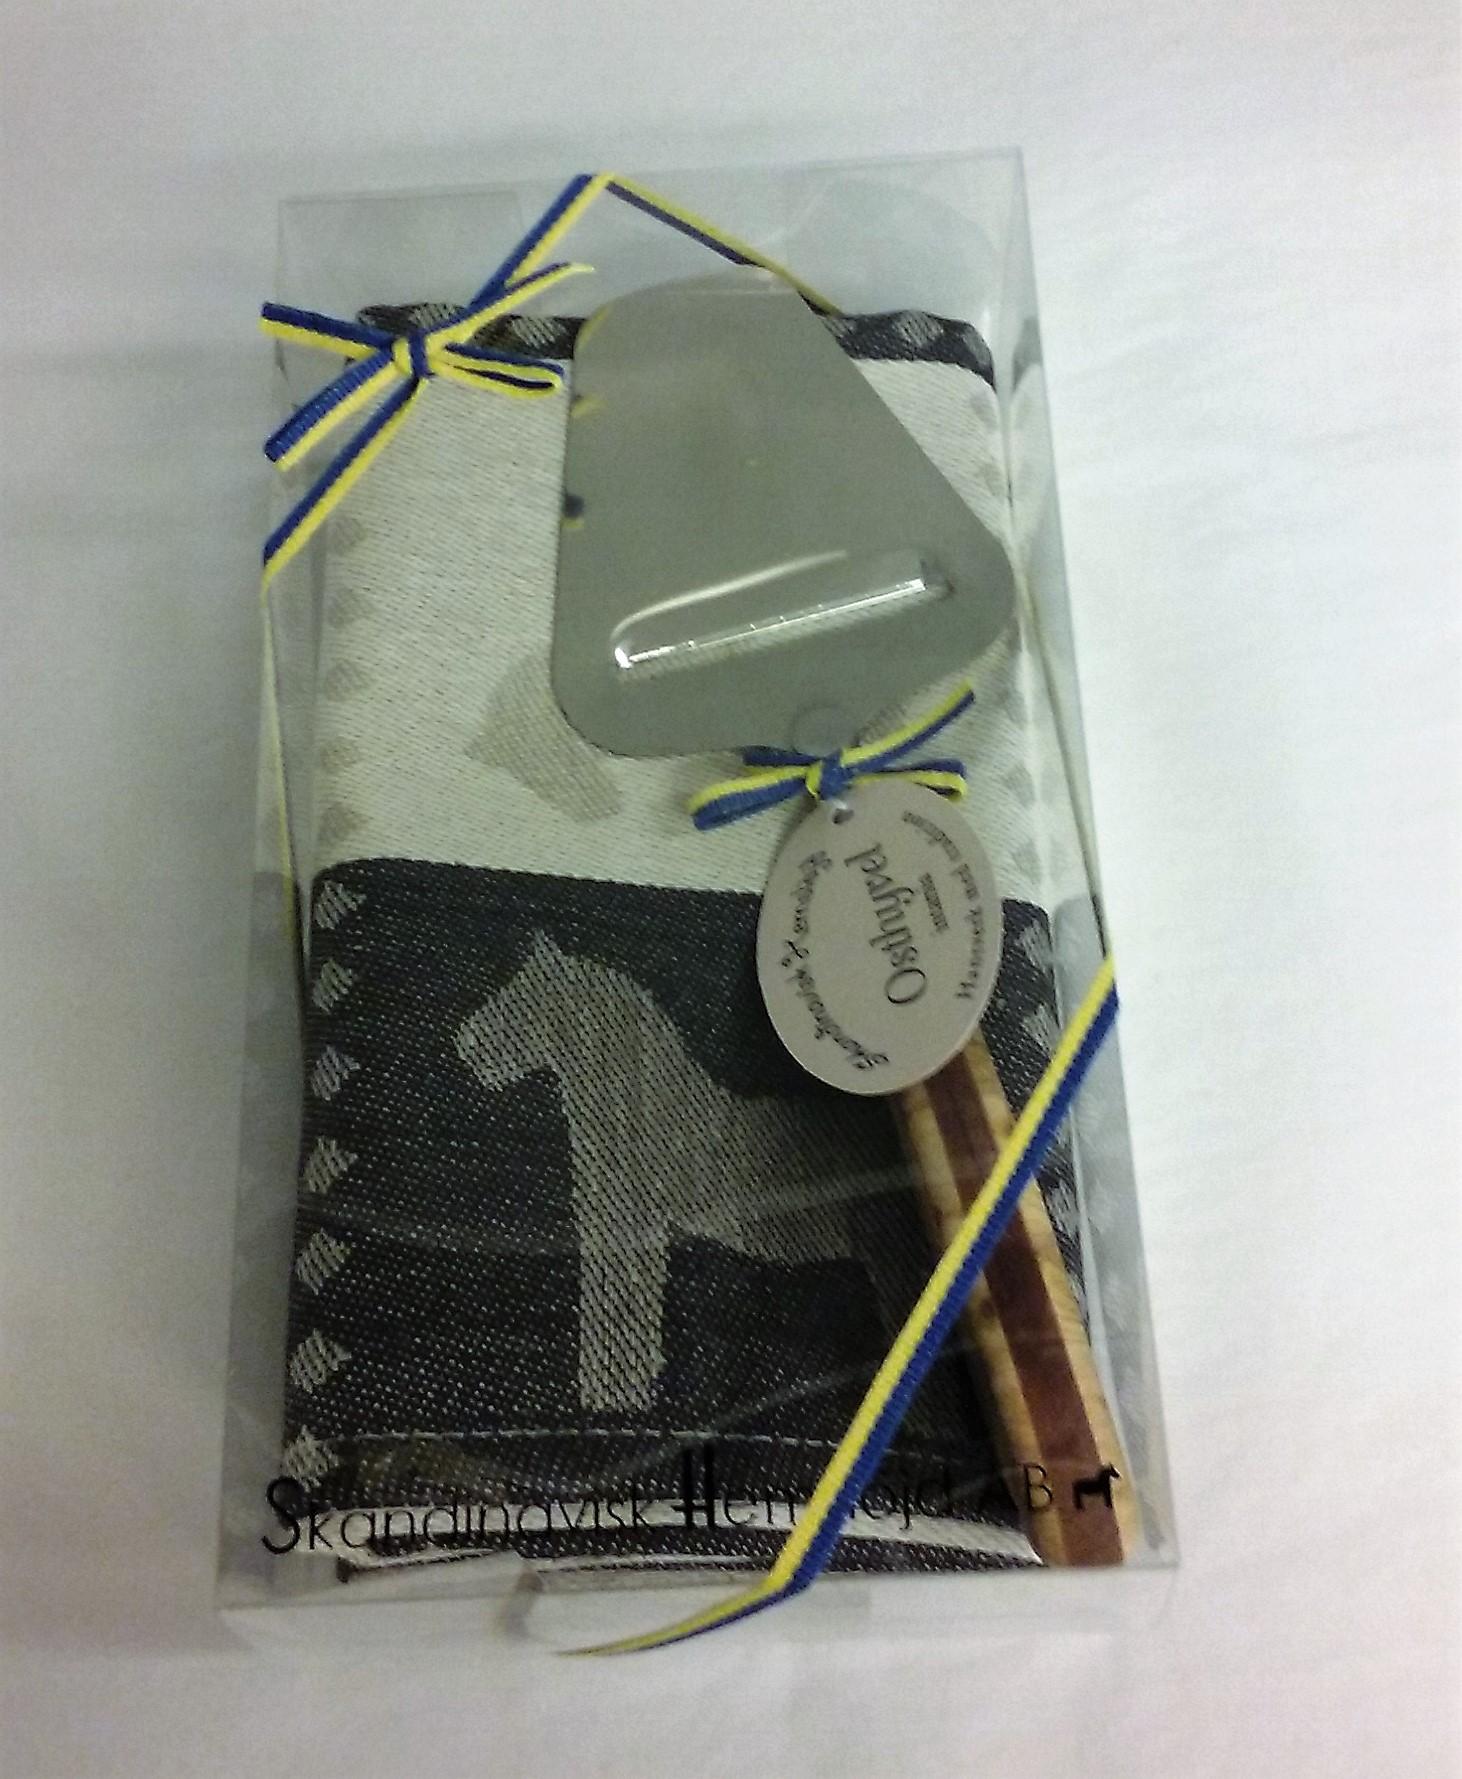 Osthyvel-handduk